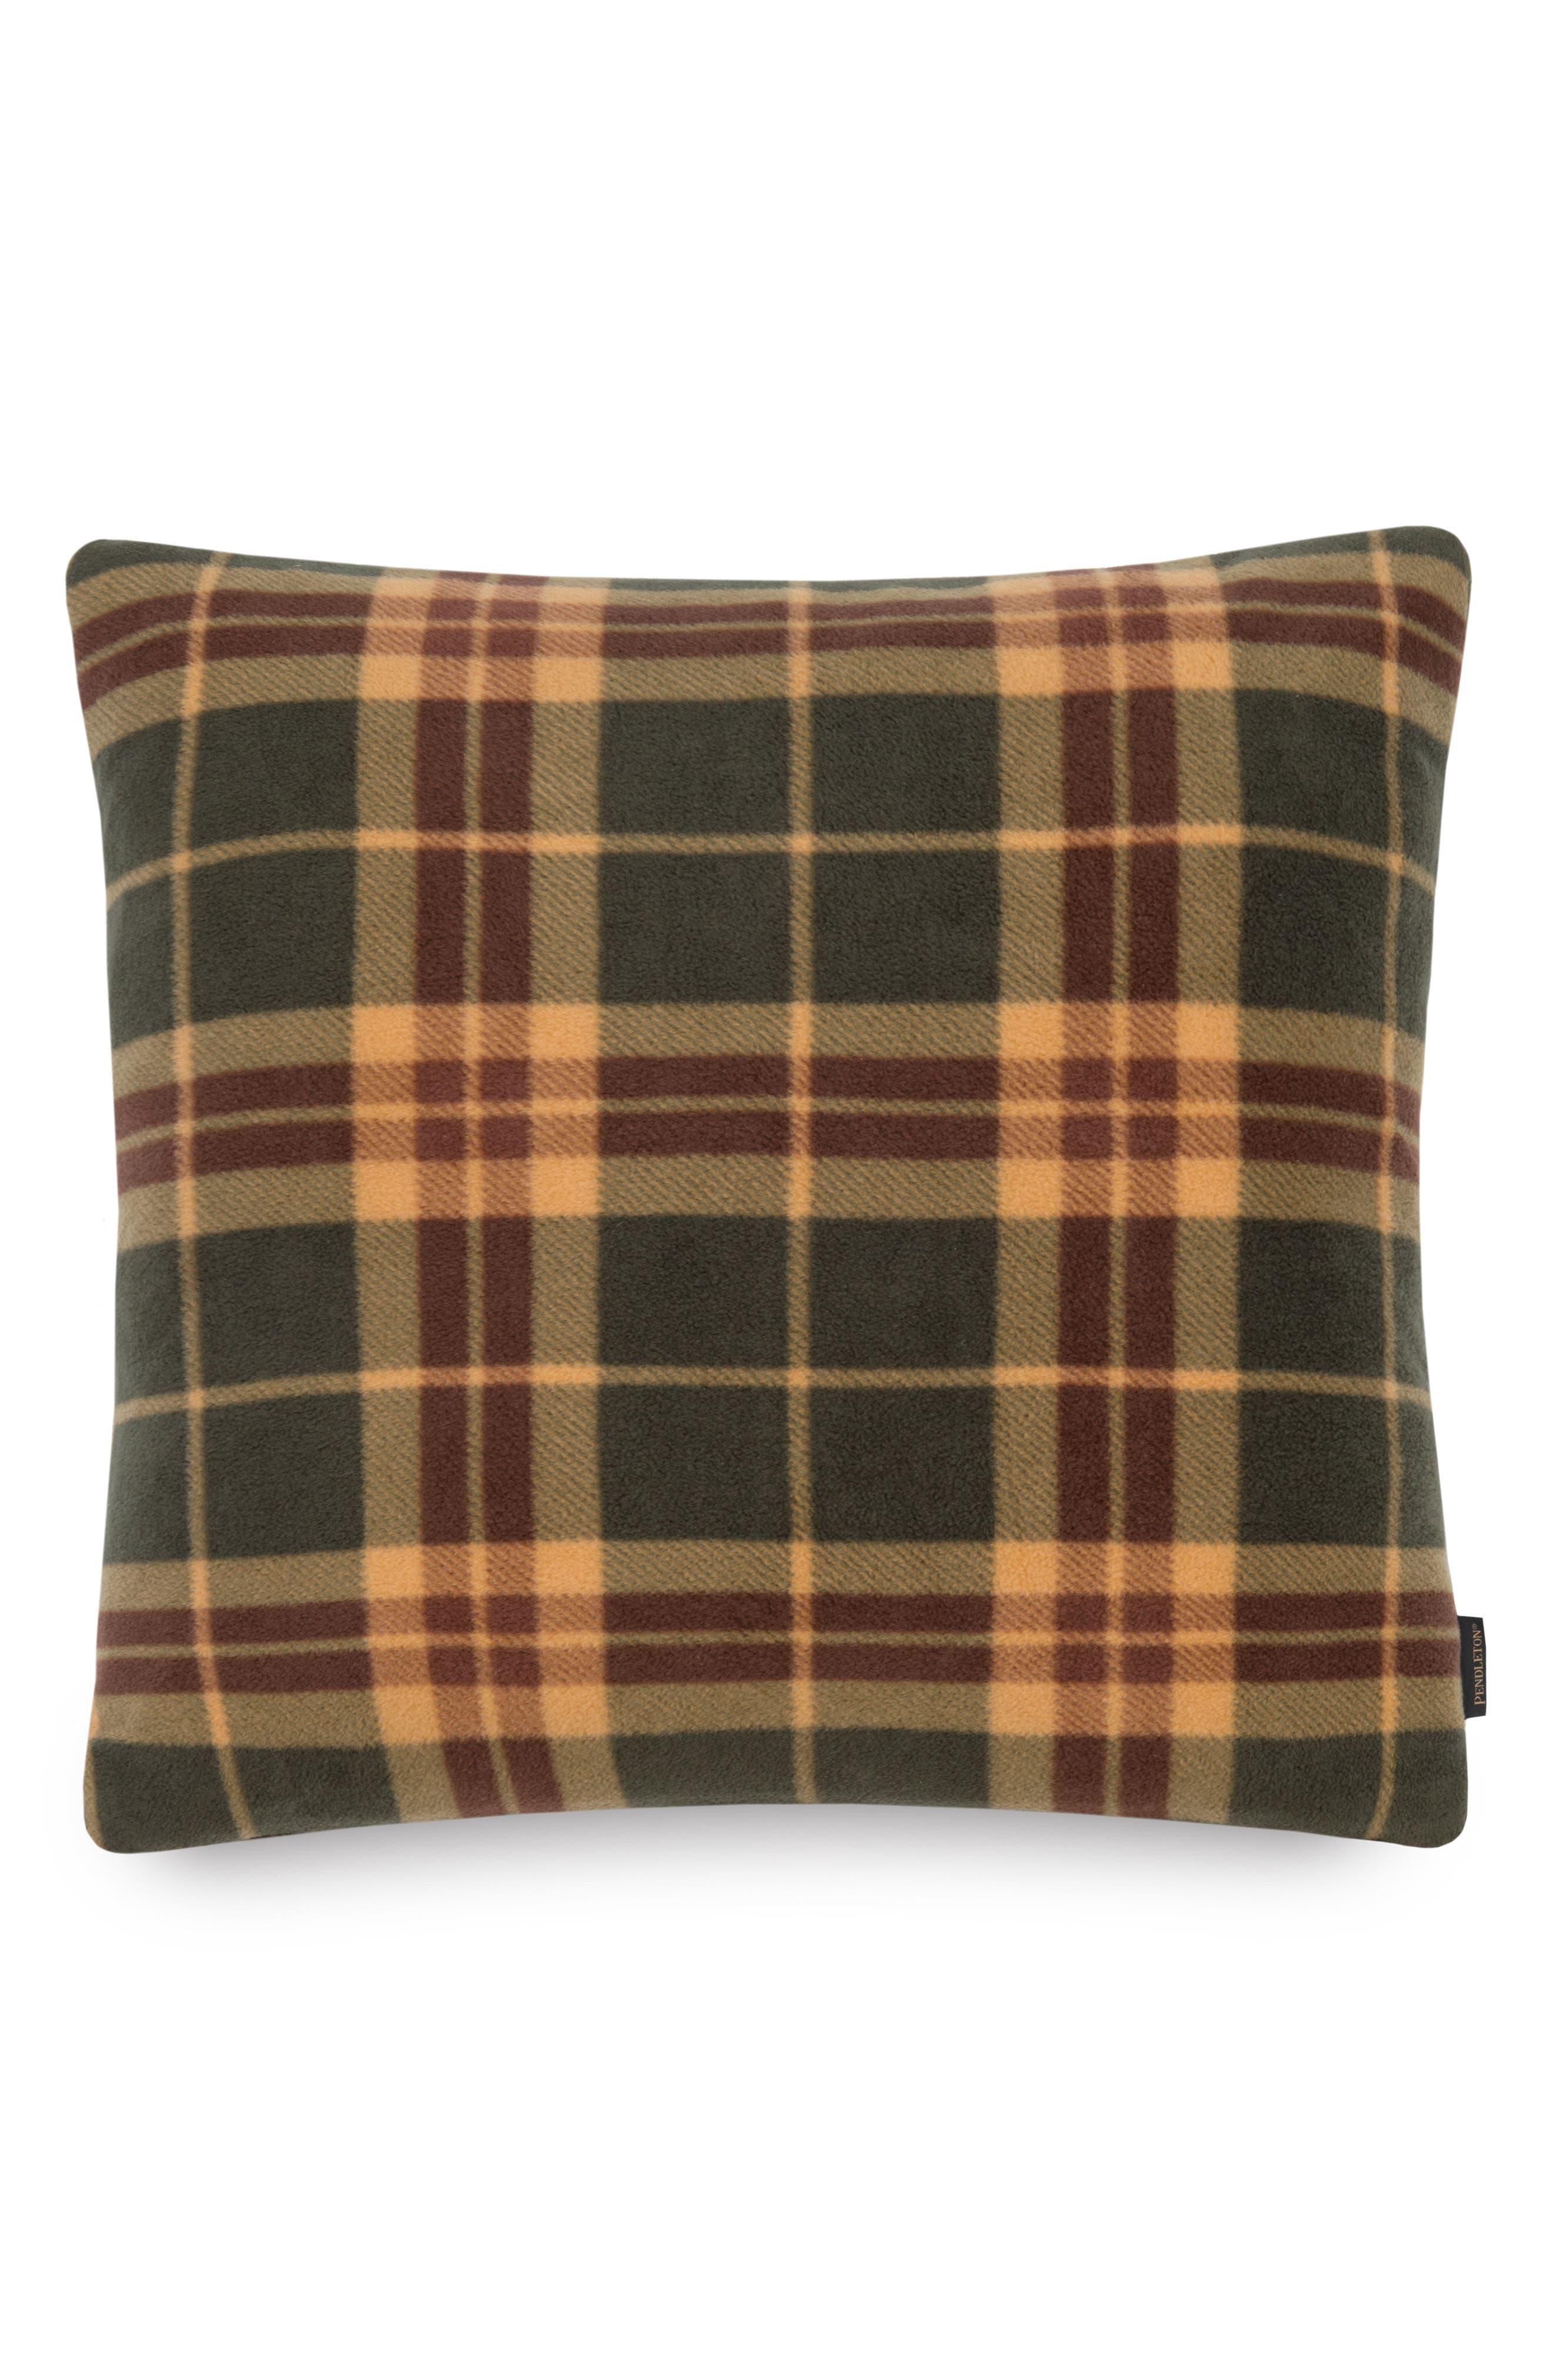 Ambler Plaid Pillow,                         Main,                         color, HUNTER